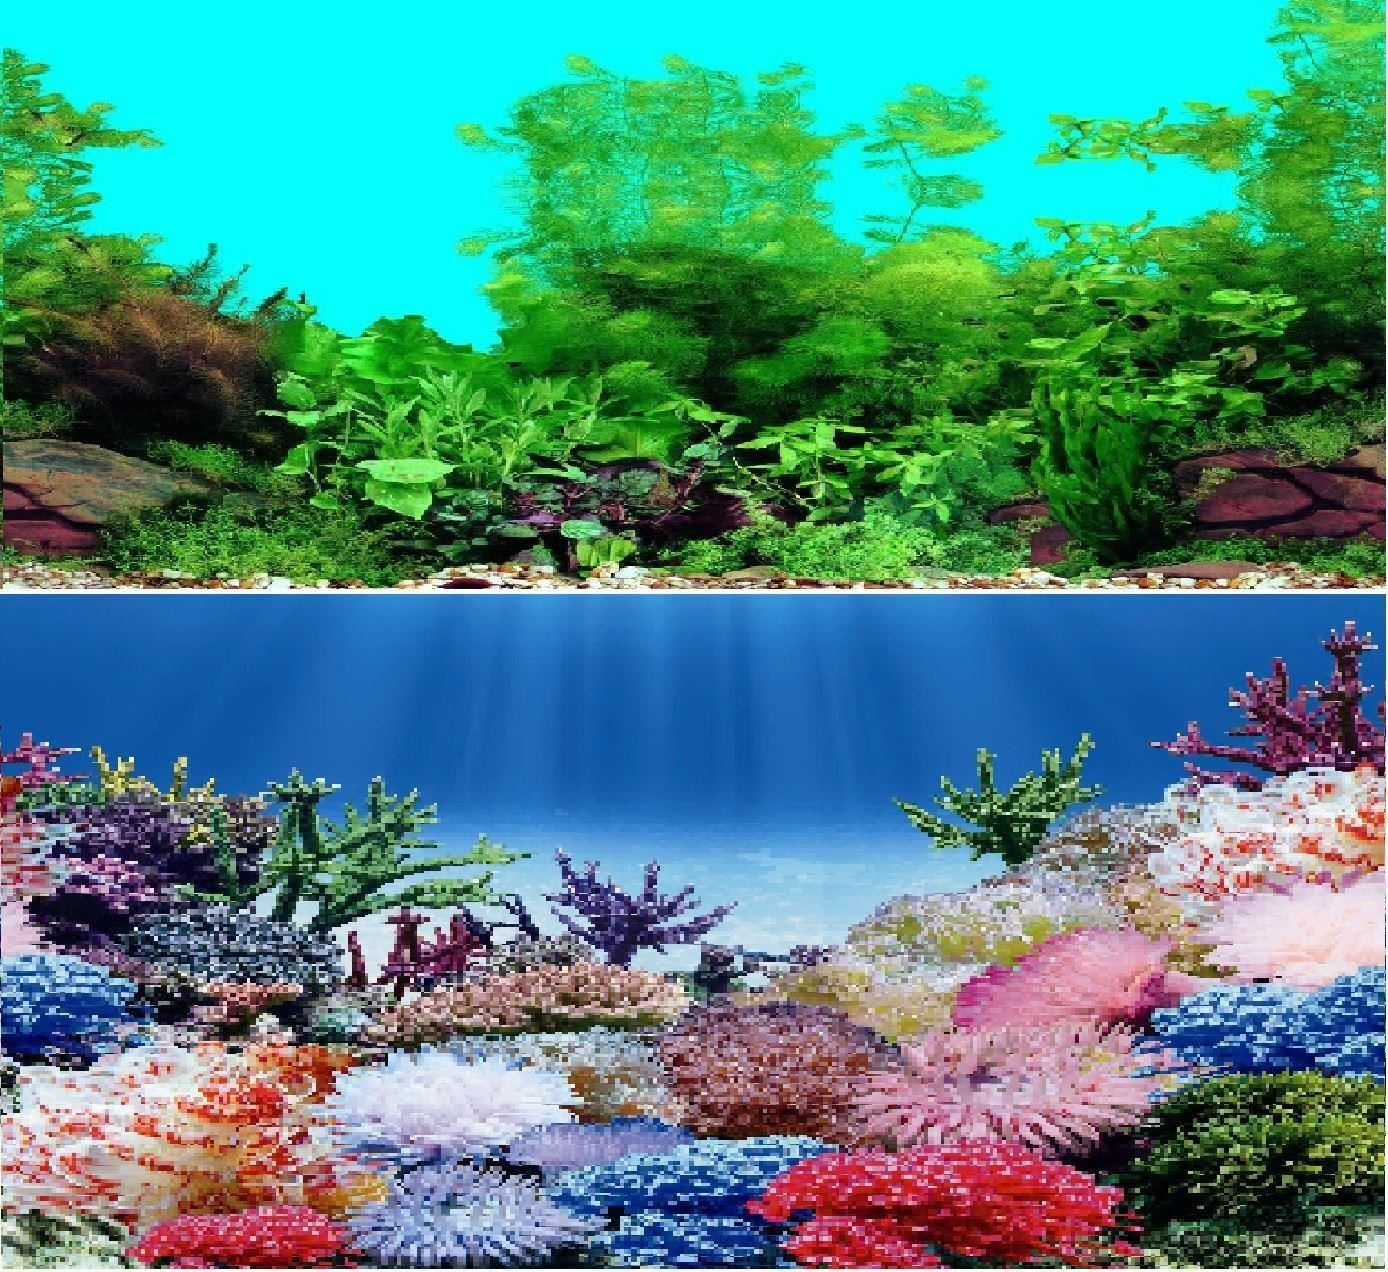 24 double sided aquarium background backdrop fish tank reptile vivarium marine ebay. Black Bedroom Furniture Sets. Home Design Ideas